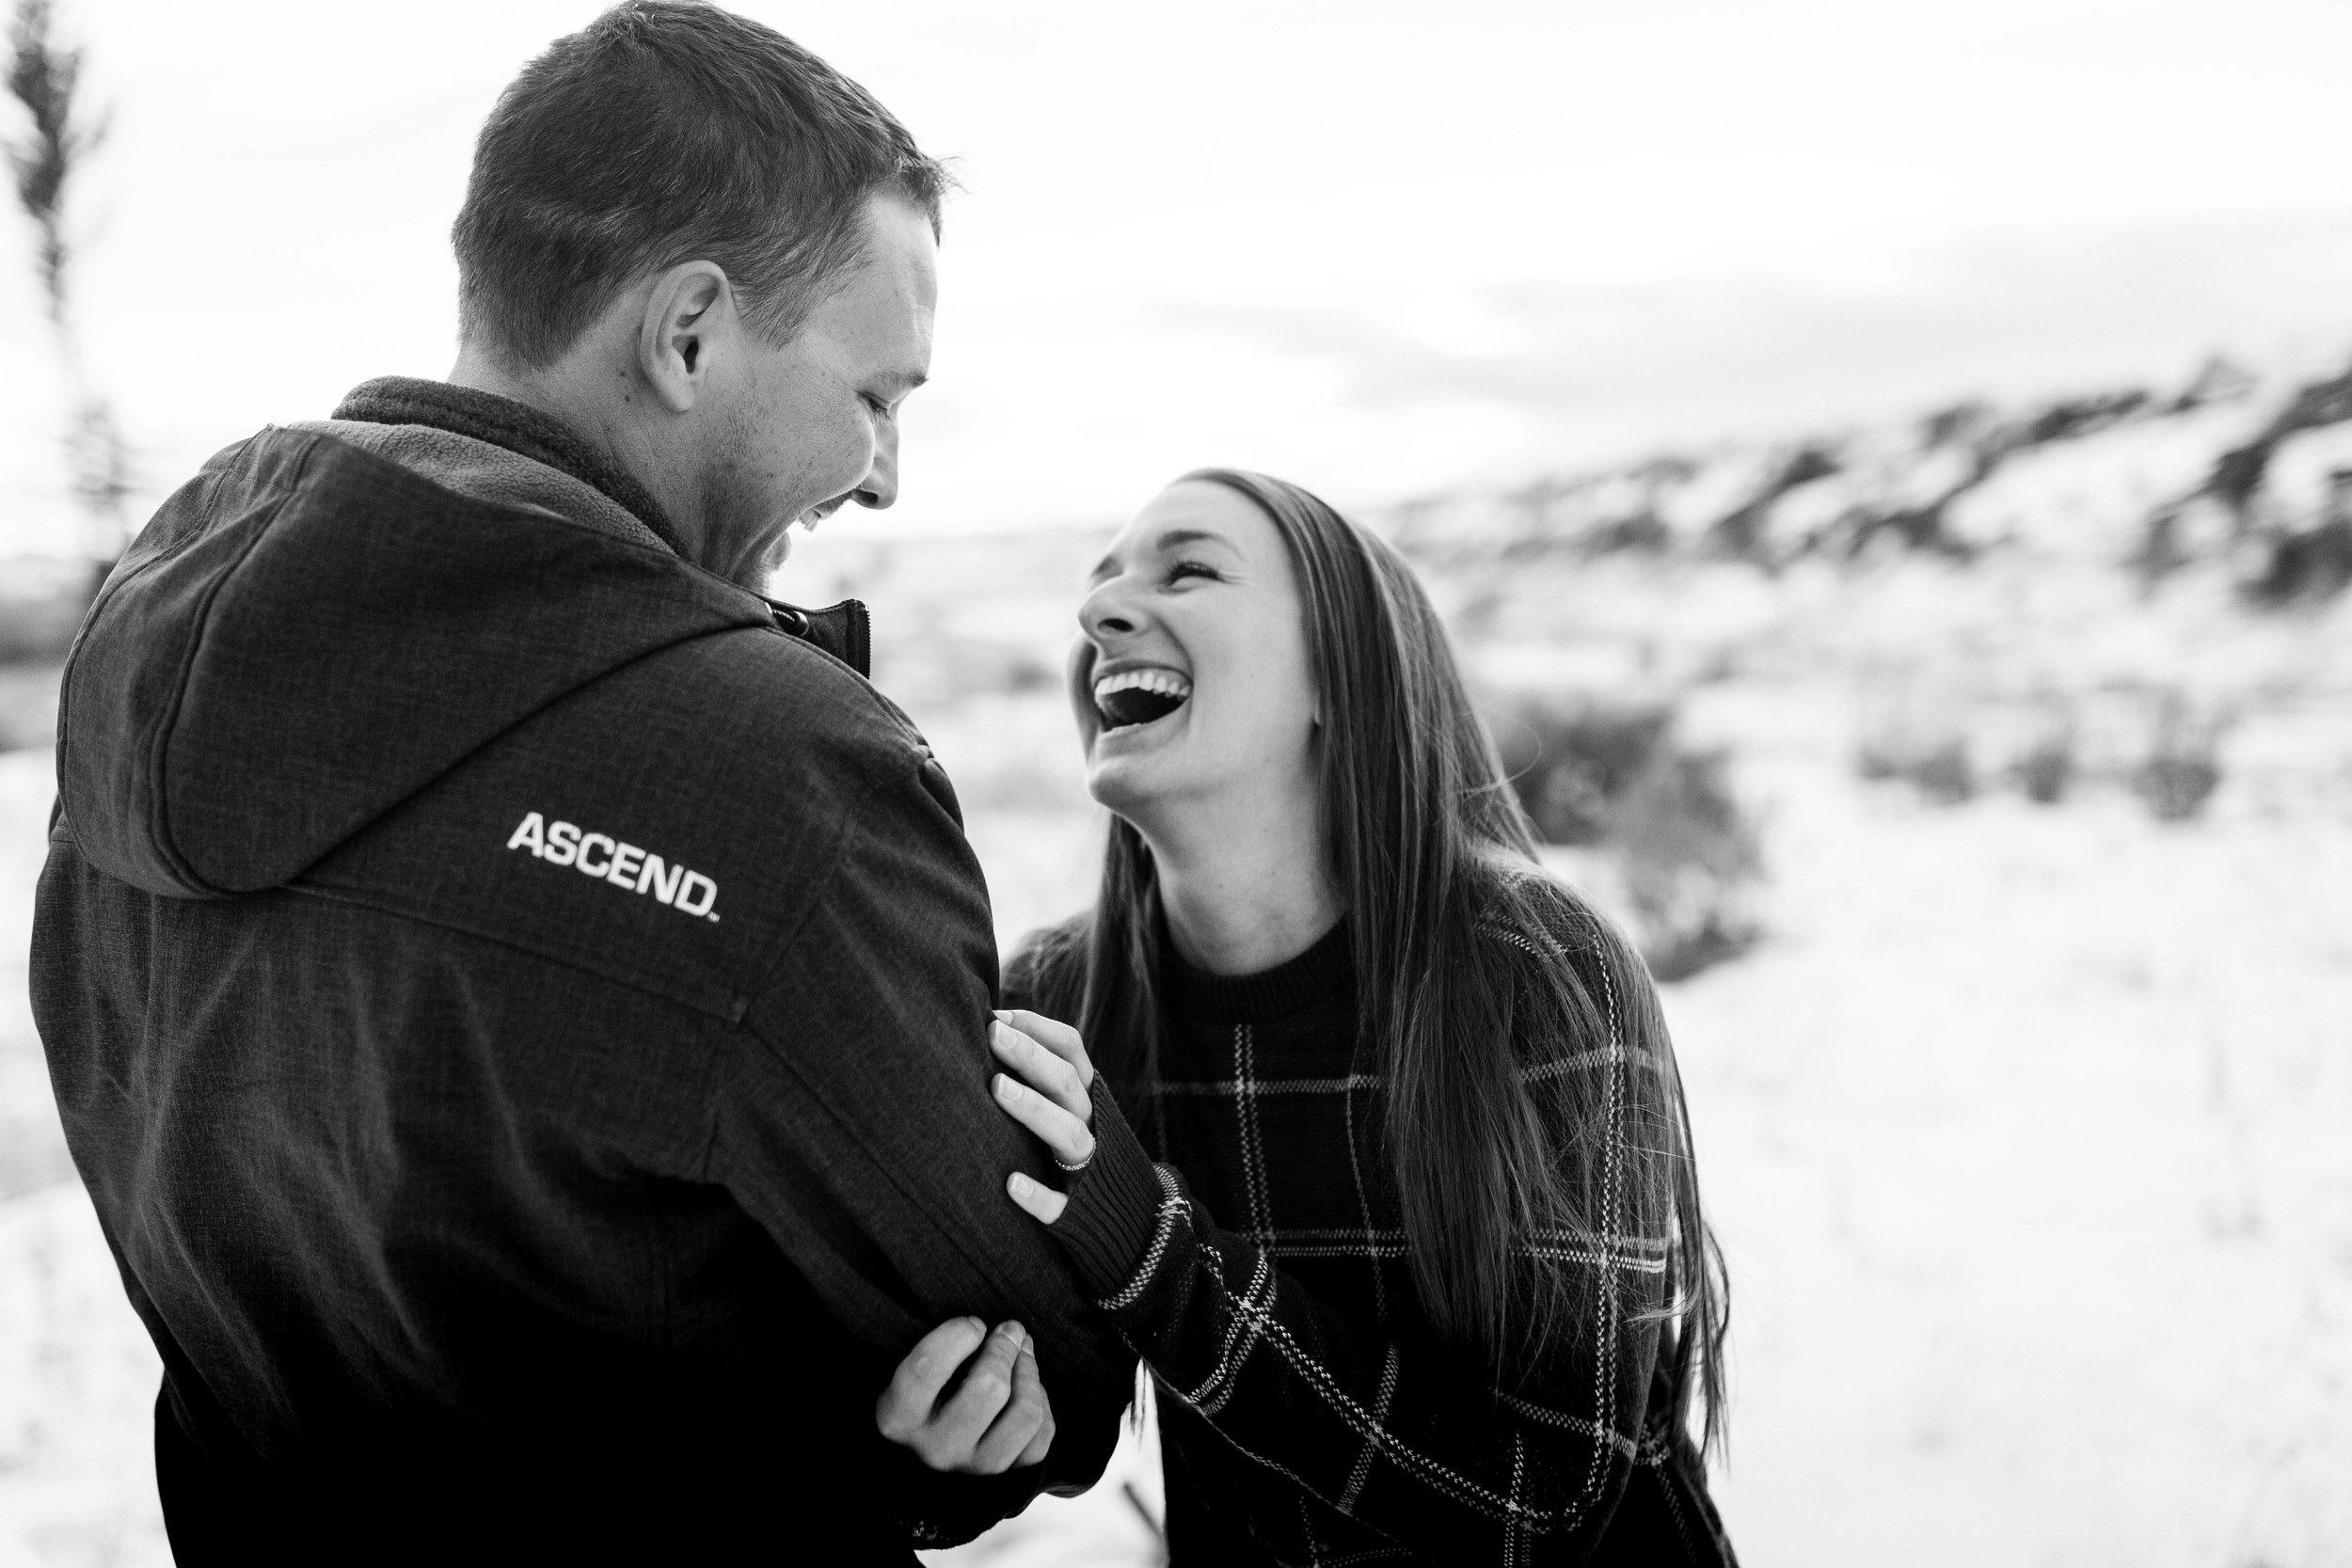 nicole-daacke-photography-grand-teton-elopement-grand-teton-wedding-national-park-wedding-adventure-wedding-adventurous-engagement-session-snowy-winter-inspiration-photographer-5.jpg